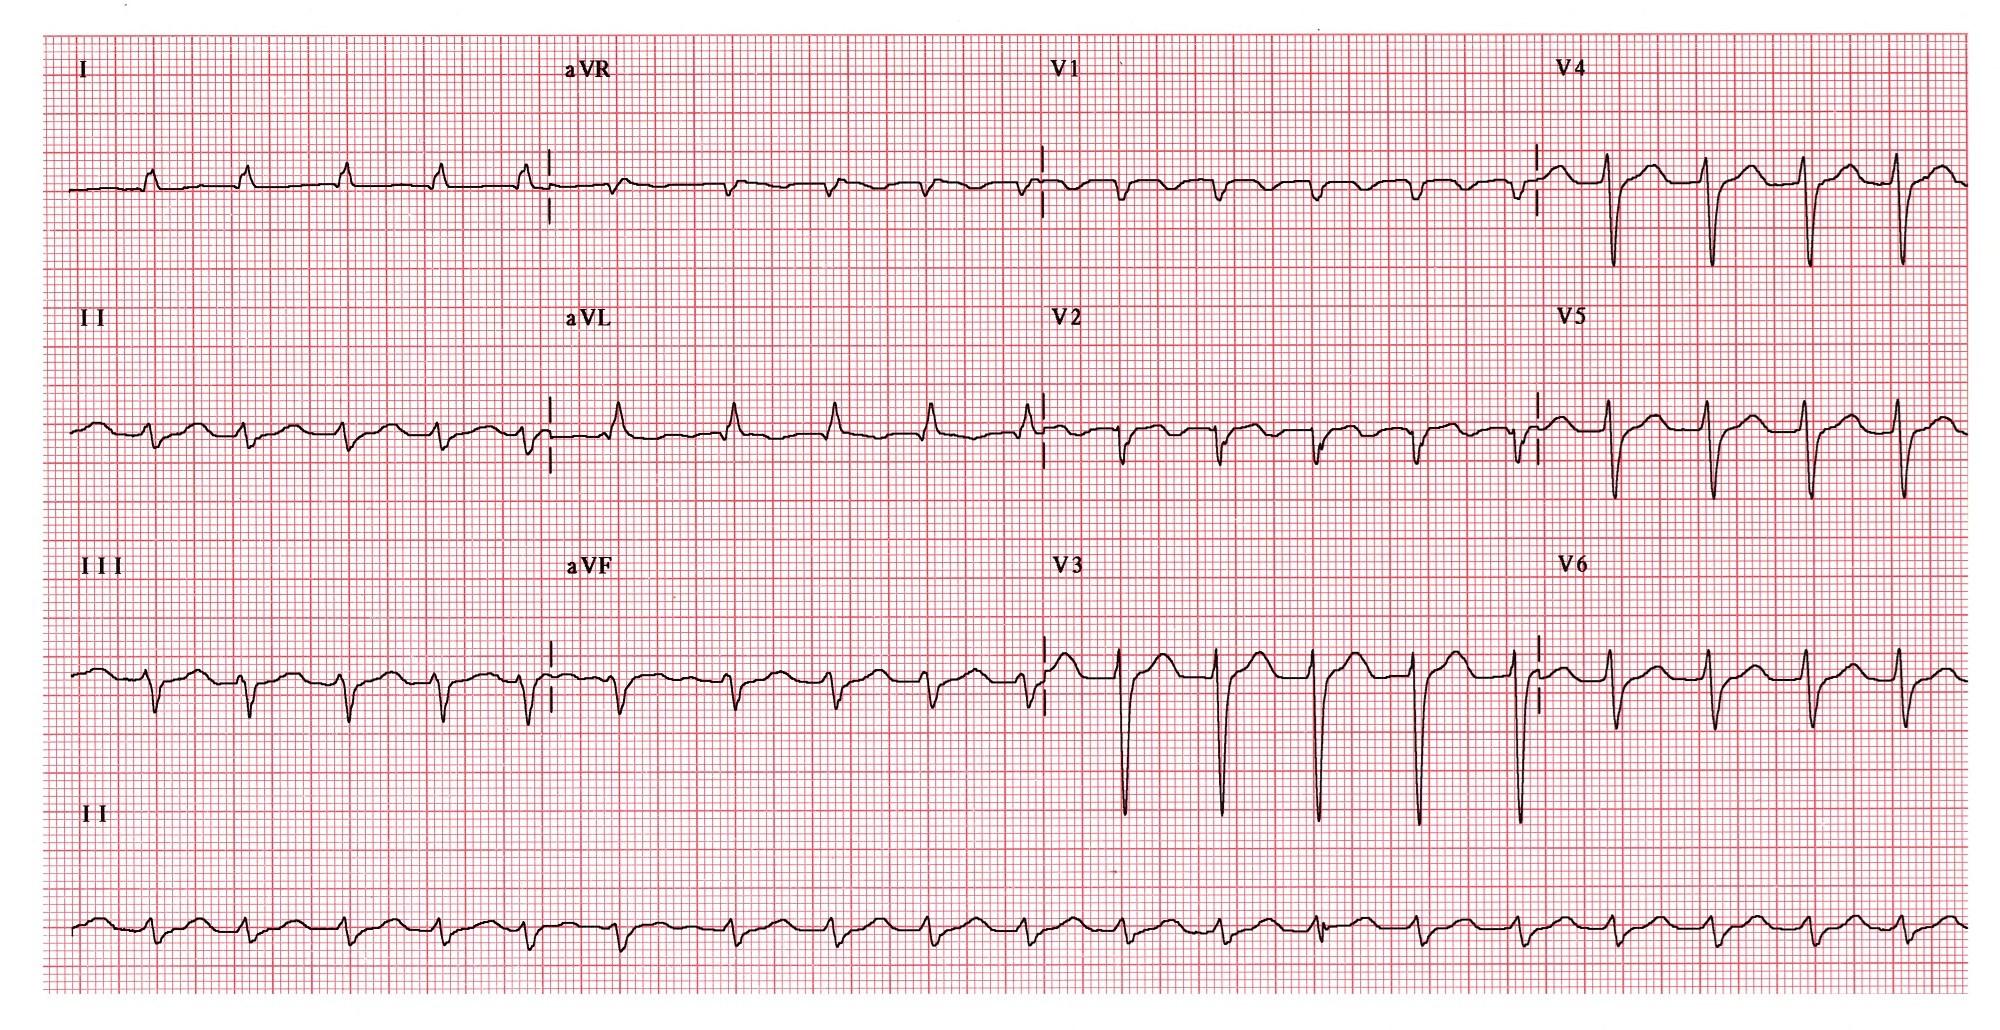 Hypothyroidism Predicts Atrial Tachyarrhythmia After AF Catheter Ablation